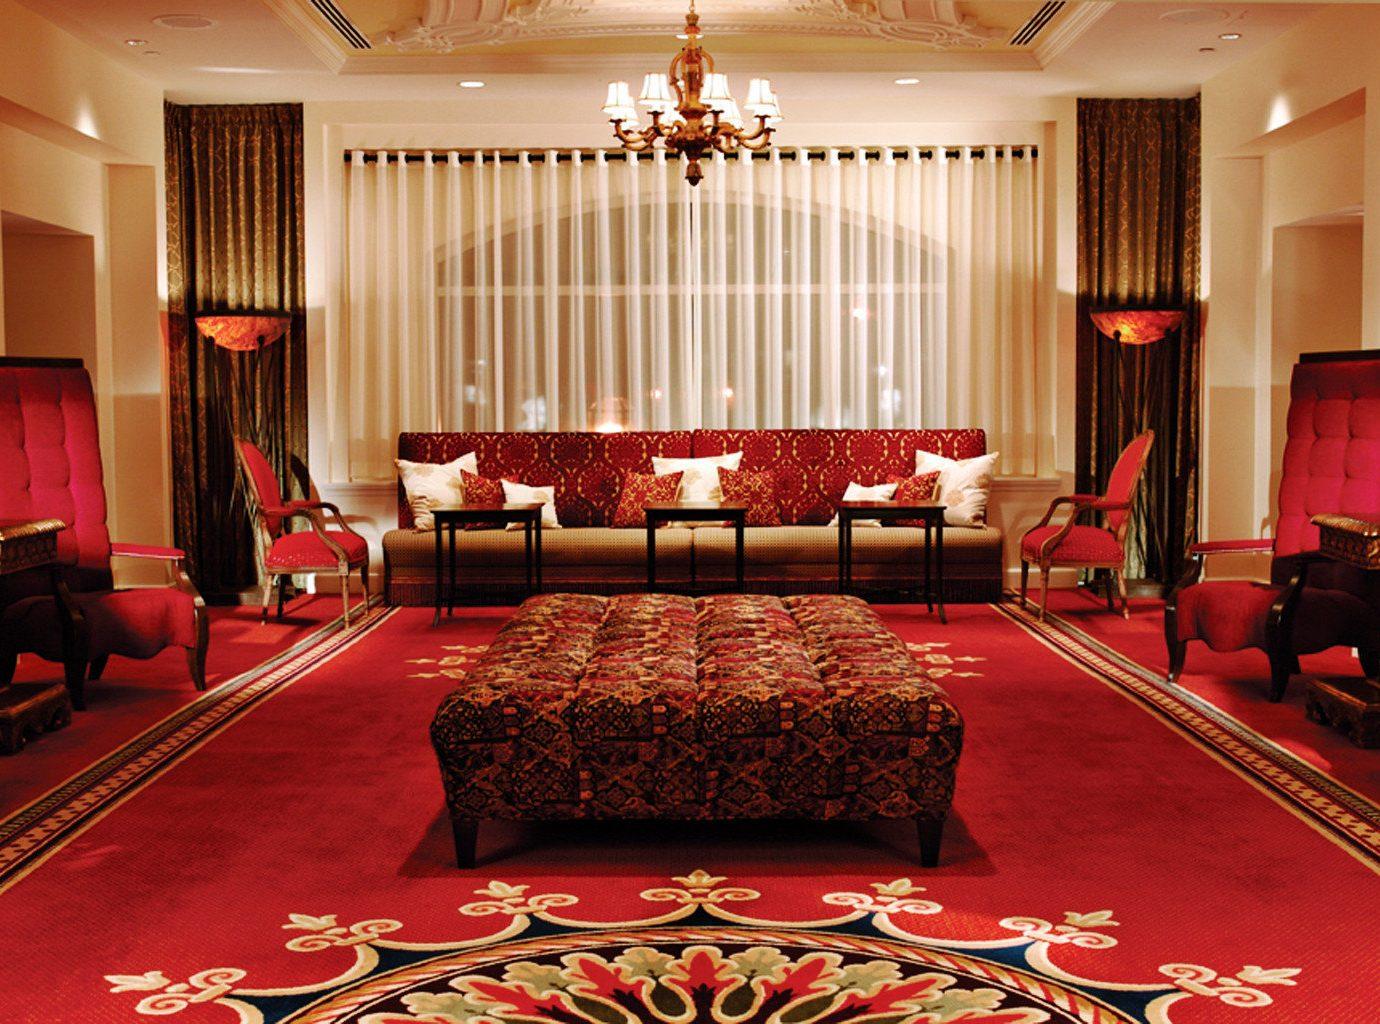 Elegant Historic Hotels Living Lounge Luxury indoor room wall red floor window ceiling function hall Suite decorated rug interior design quinceañera ballroom furniture billiard room hotel several